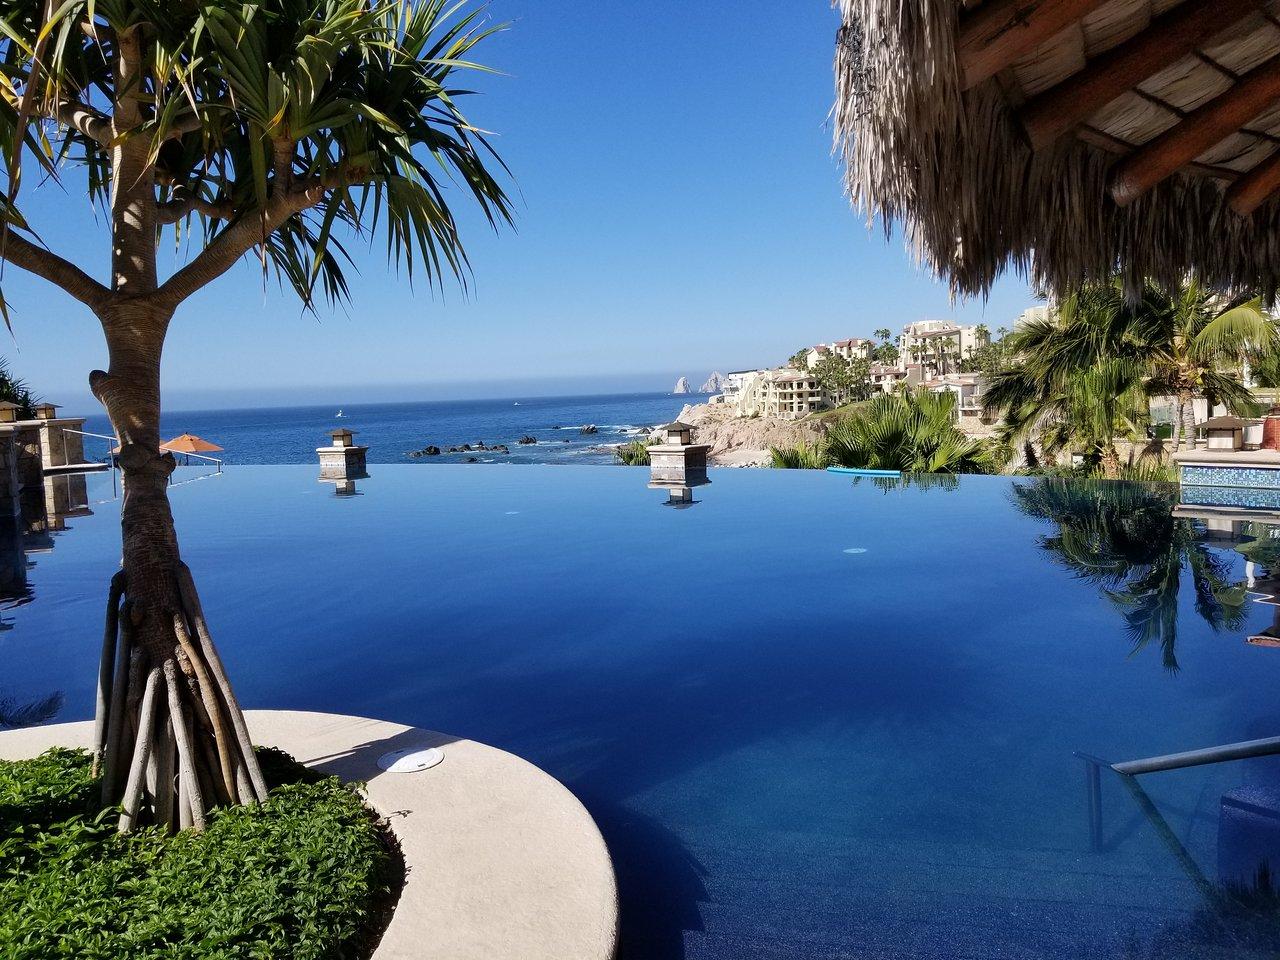 Welk_Resorts_Cabo_San_Lucas_Sirena_del_Mar_Pool_9e21e1cb00.jpg